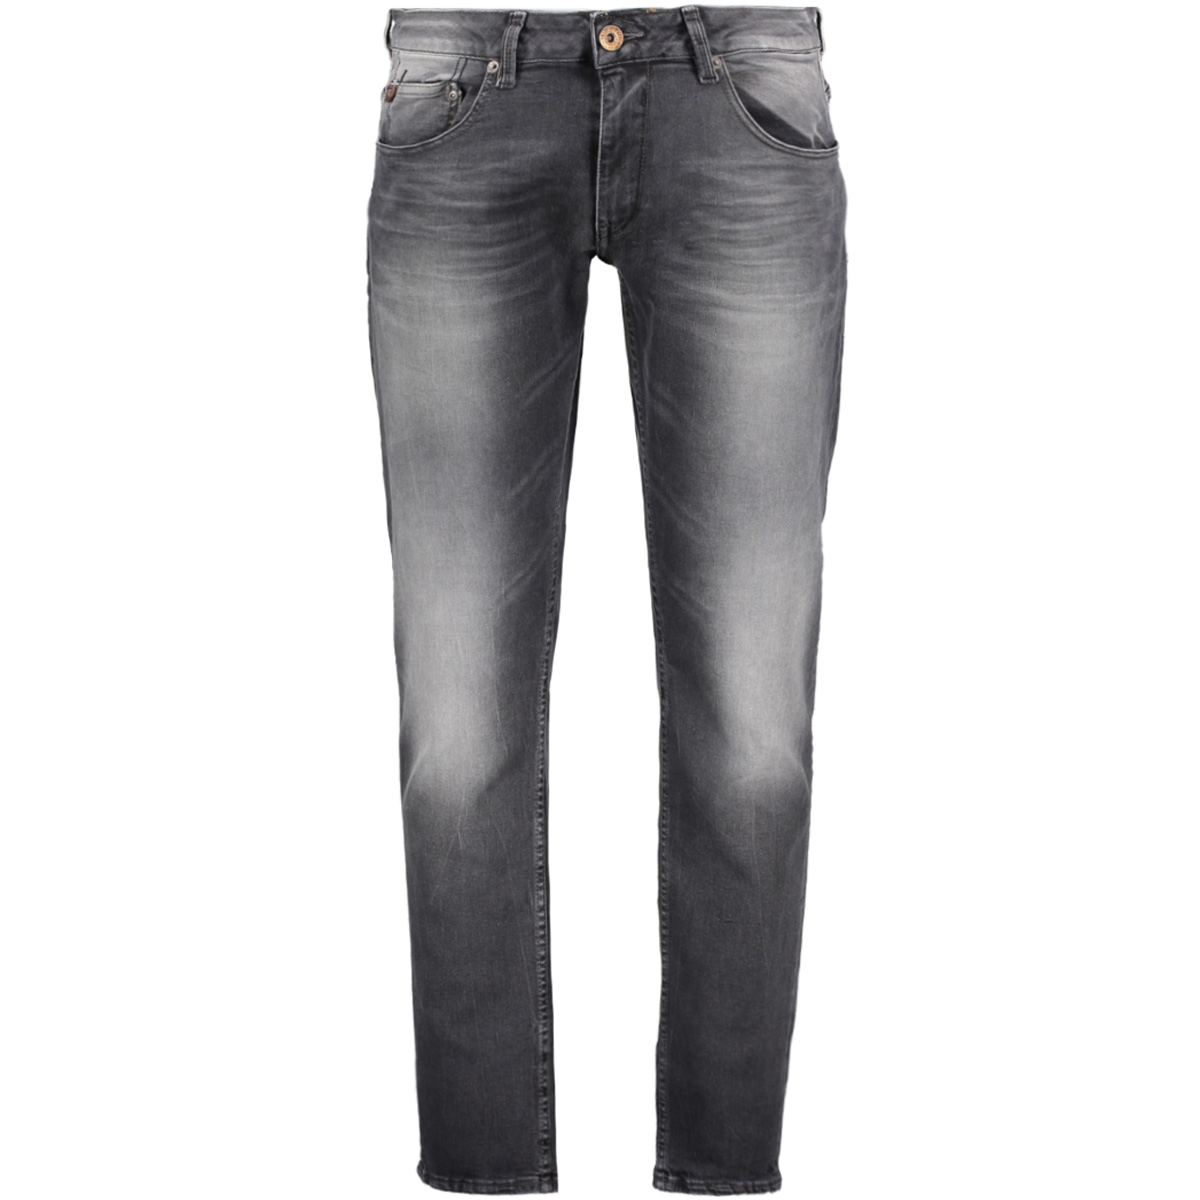 611/32 col.2012_russo garcia jeans 2012 smoke denim black used